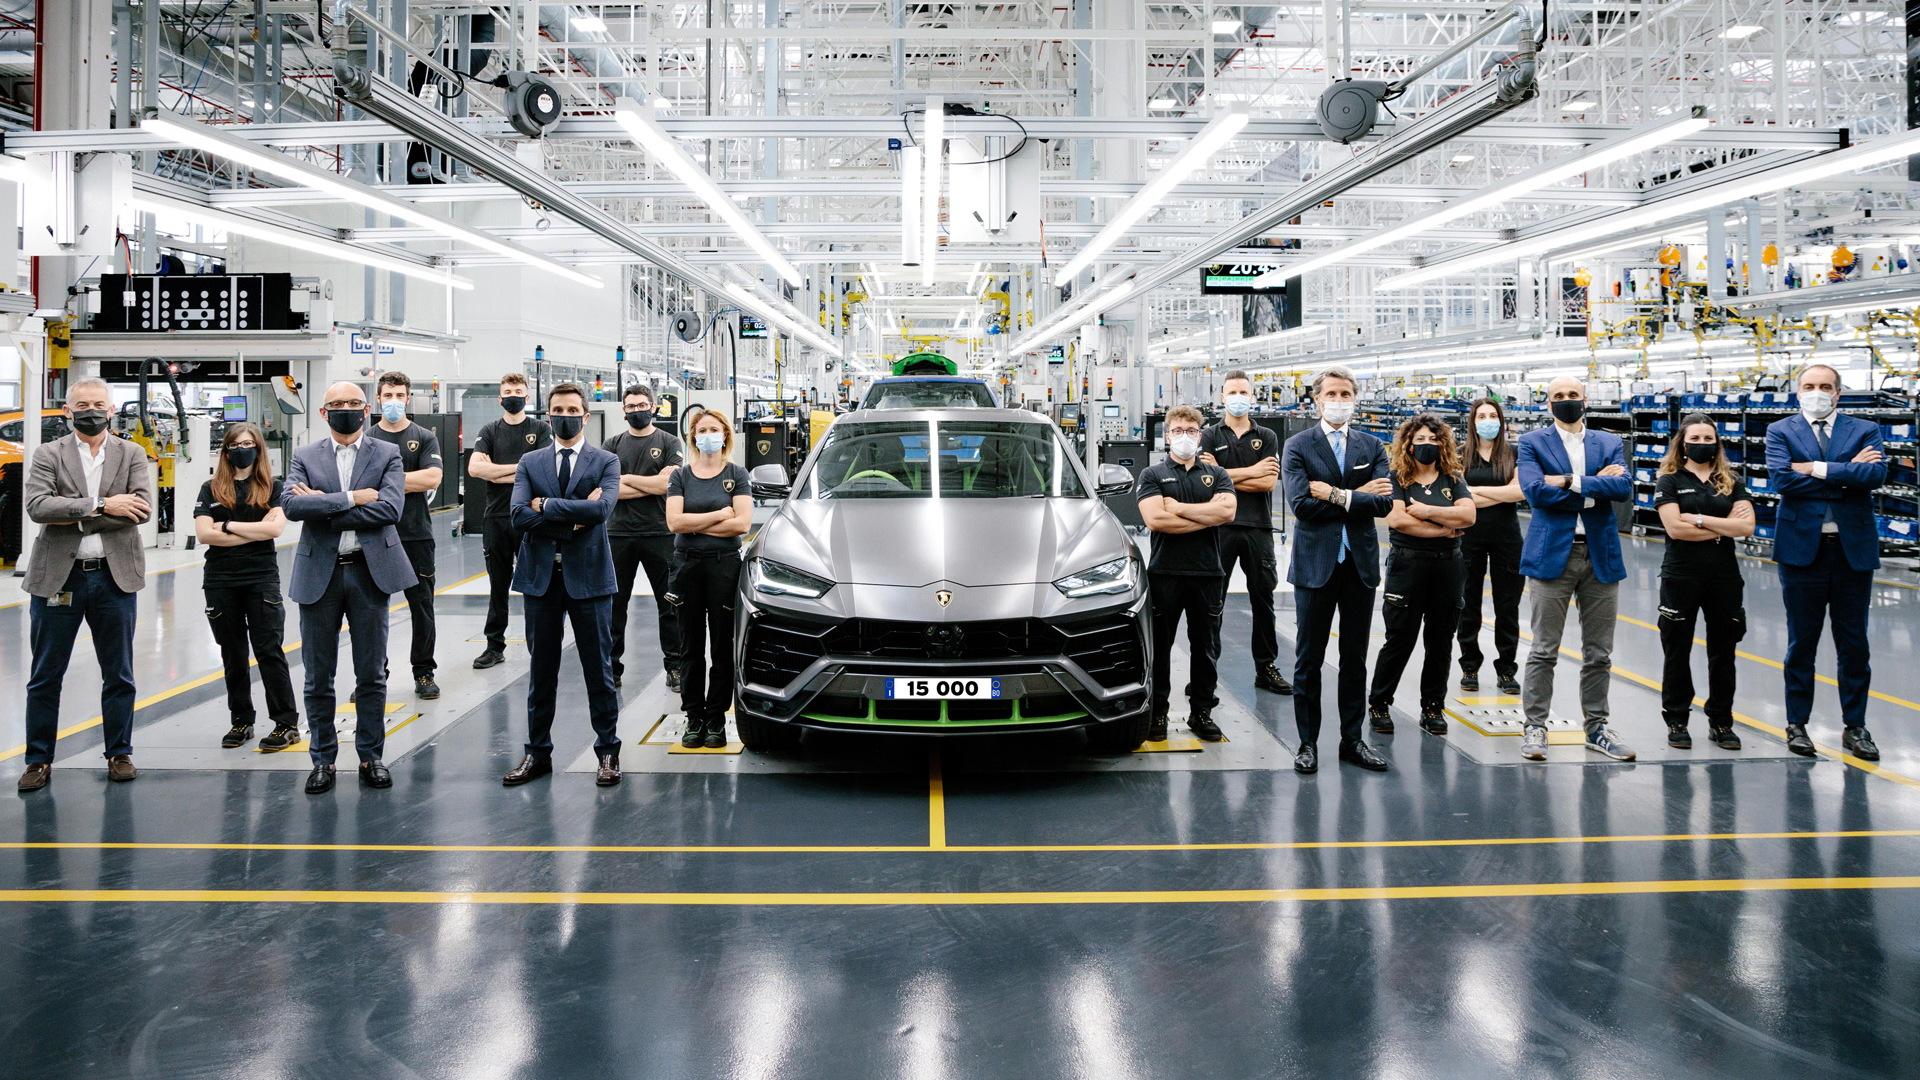 Lamborghini celebrates building the 15,000th Urus - July 20, 2021